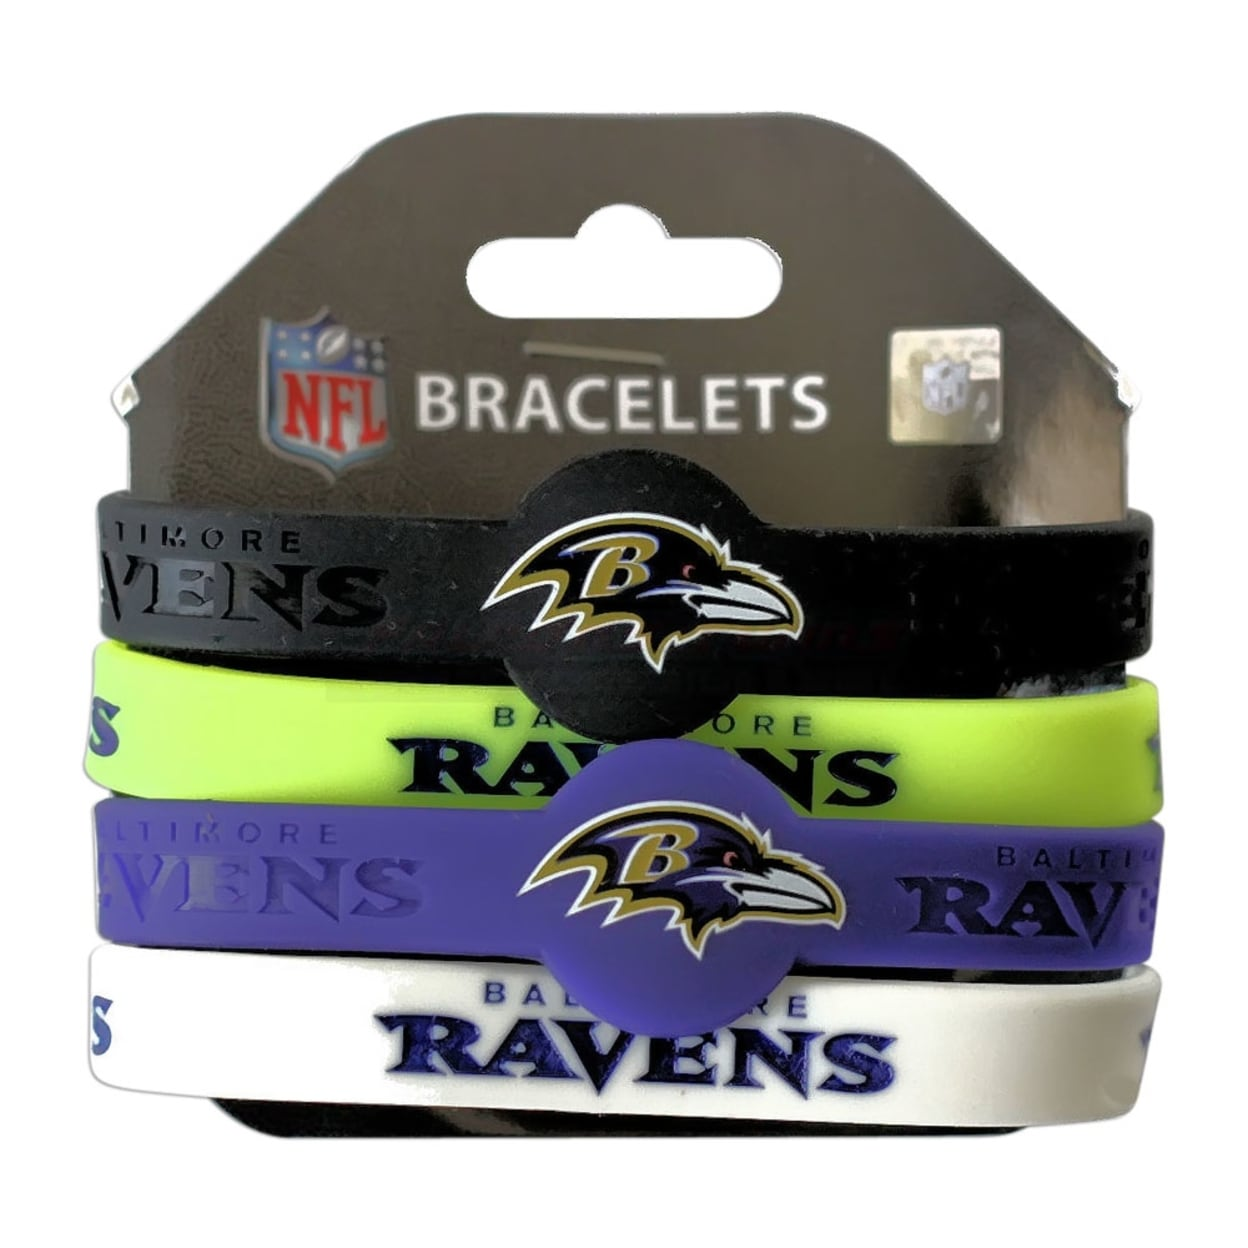 aminco Baltimore Ravens Silicone Rubber Wrist Band Bracelet Set of 4